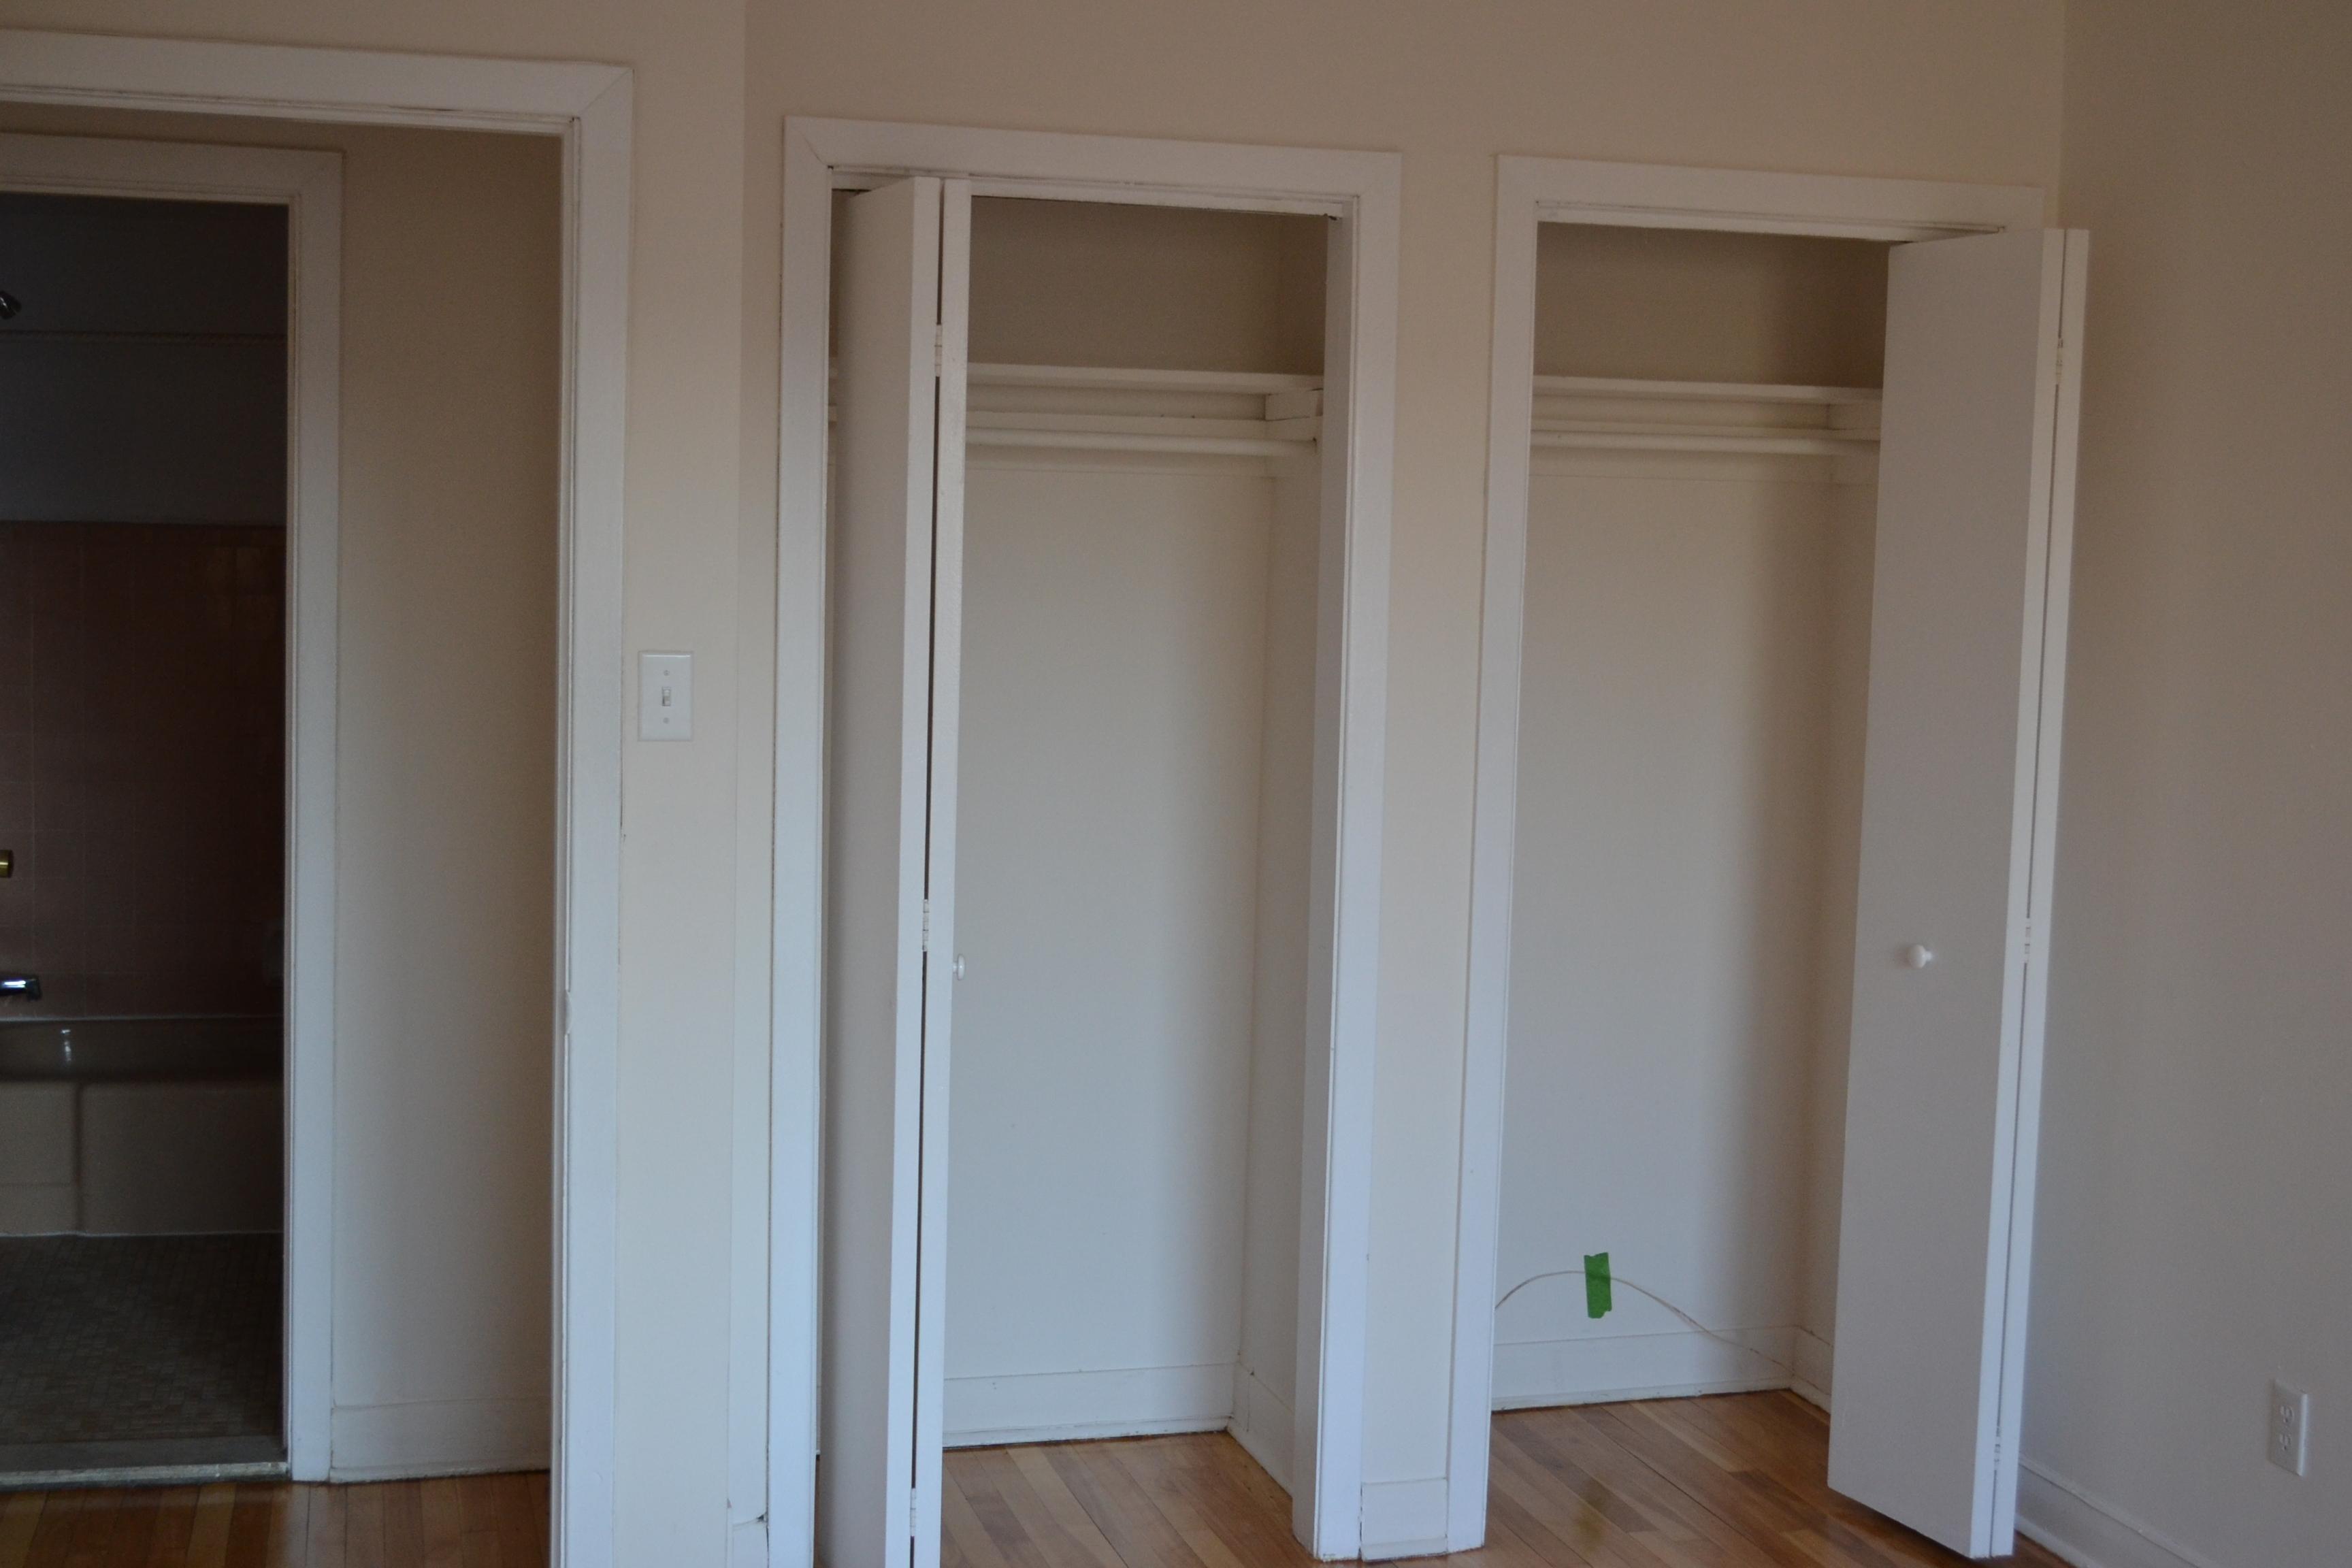 1 bedroom Apartments for rent in Cote-des-Neiges at 2615-2625 Kent - Photo 03 - RentQuebecApartments – L20719